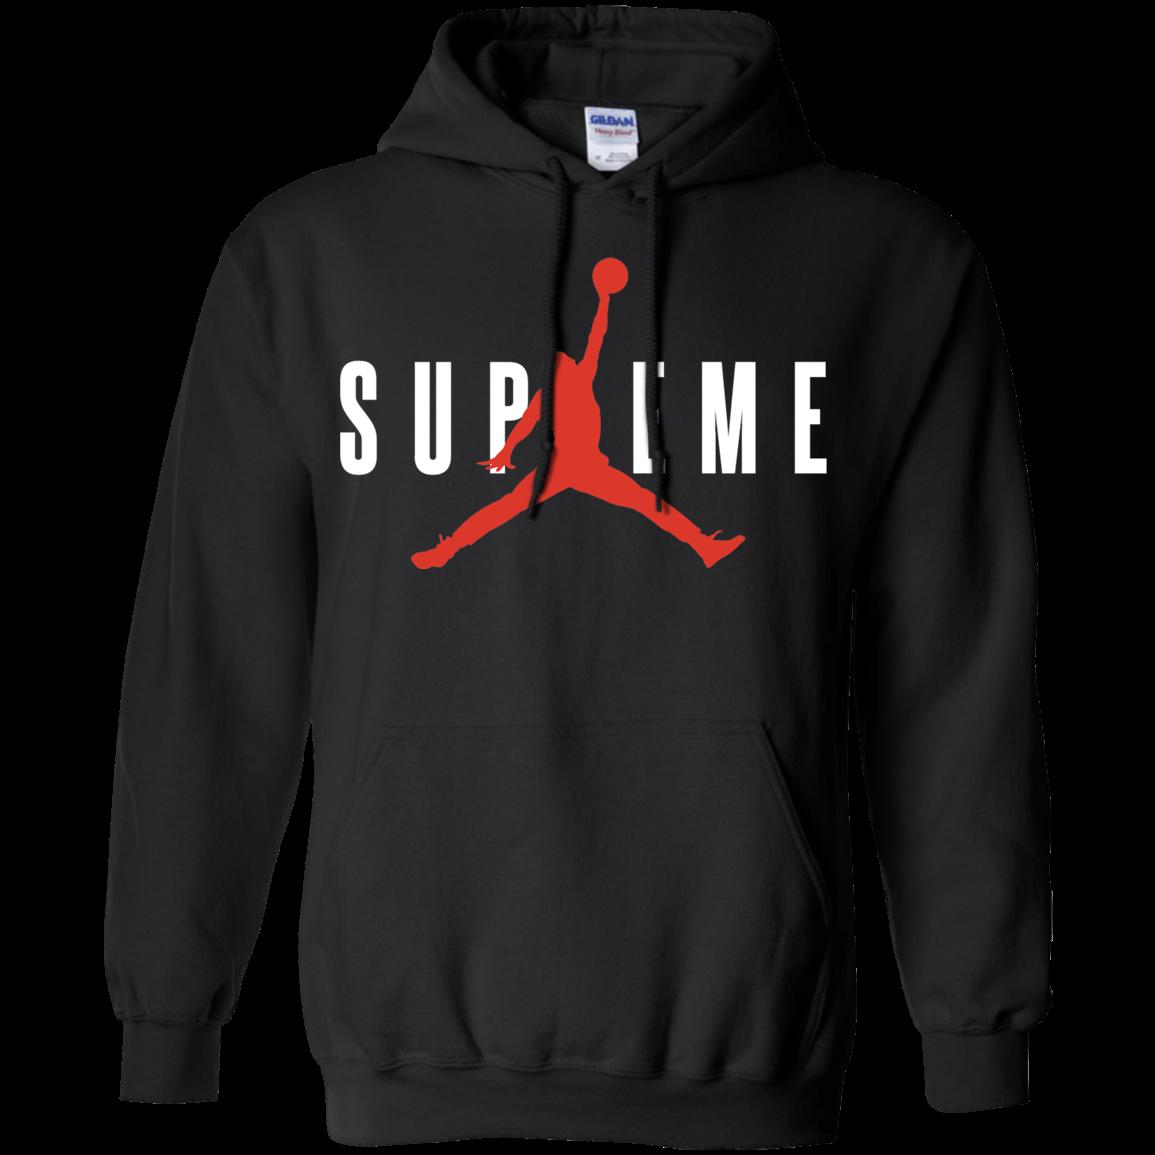 cc0977b6b2dc3e Jordan Supreme Hoodie in 2019